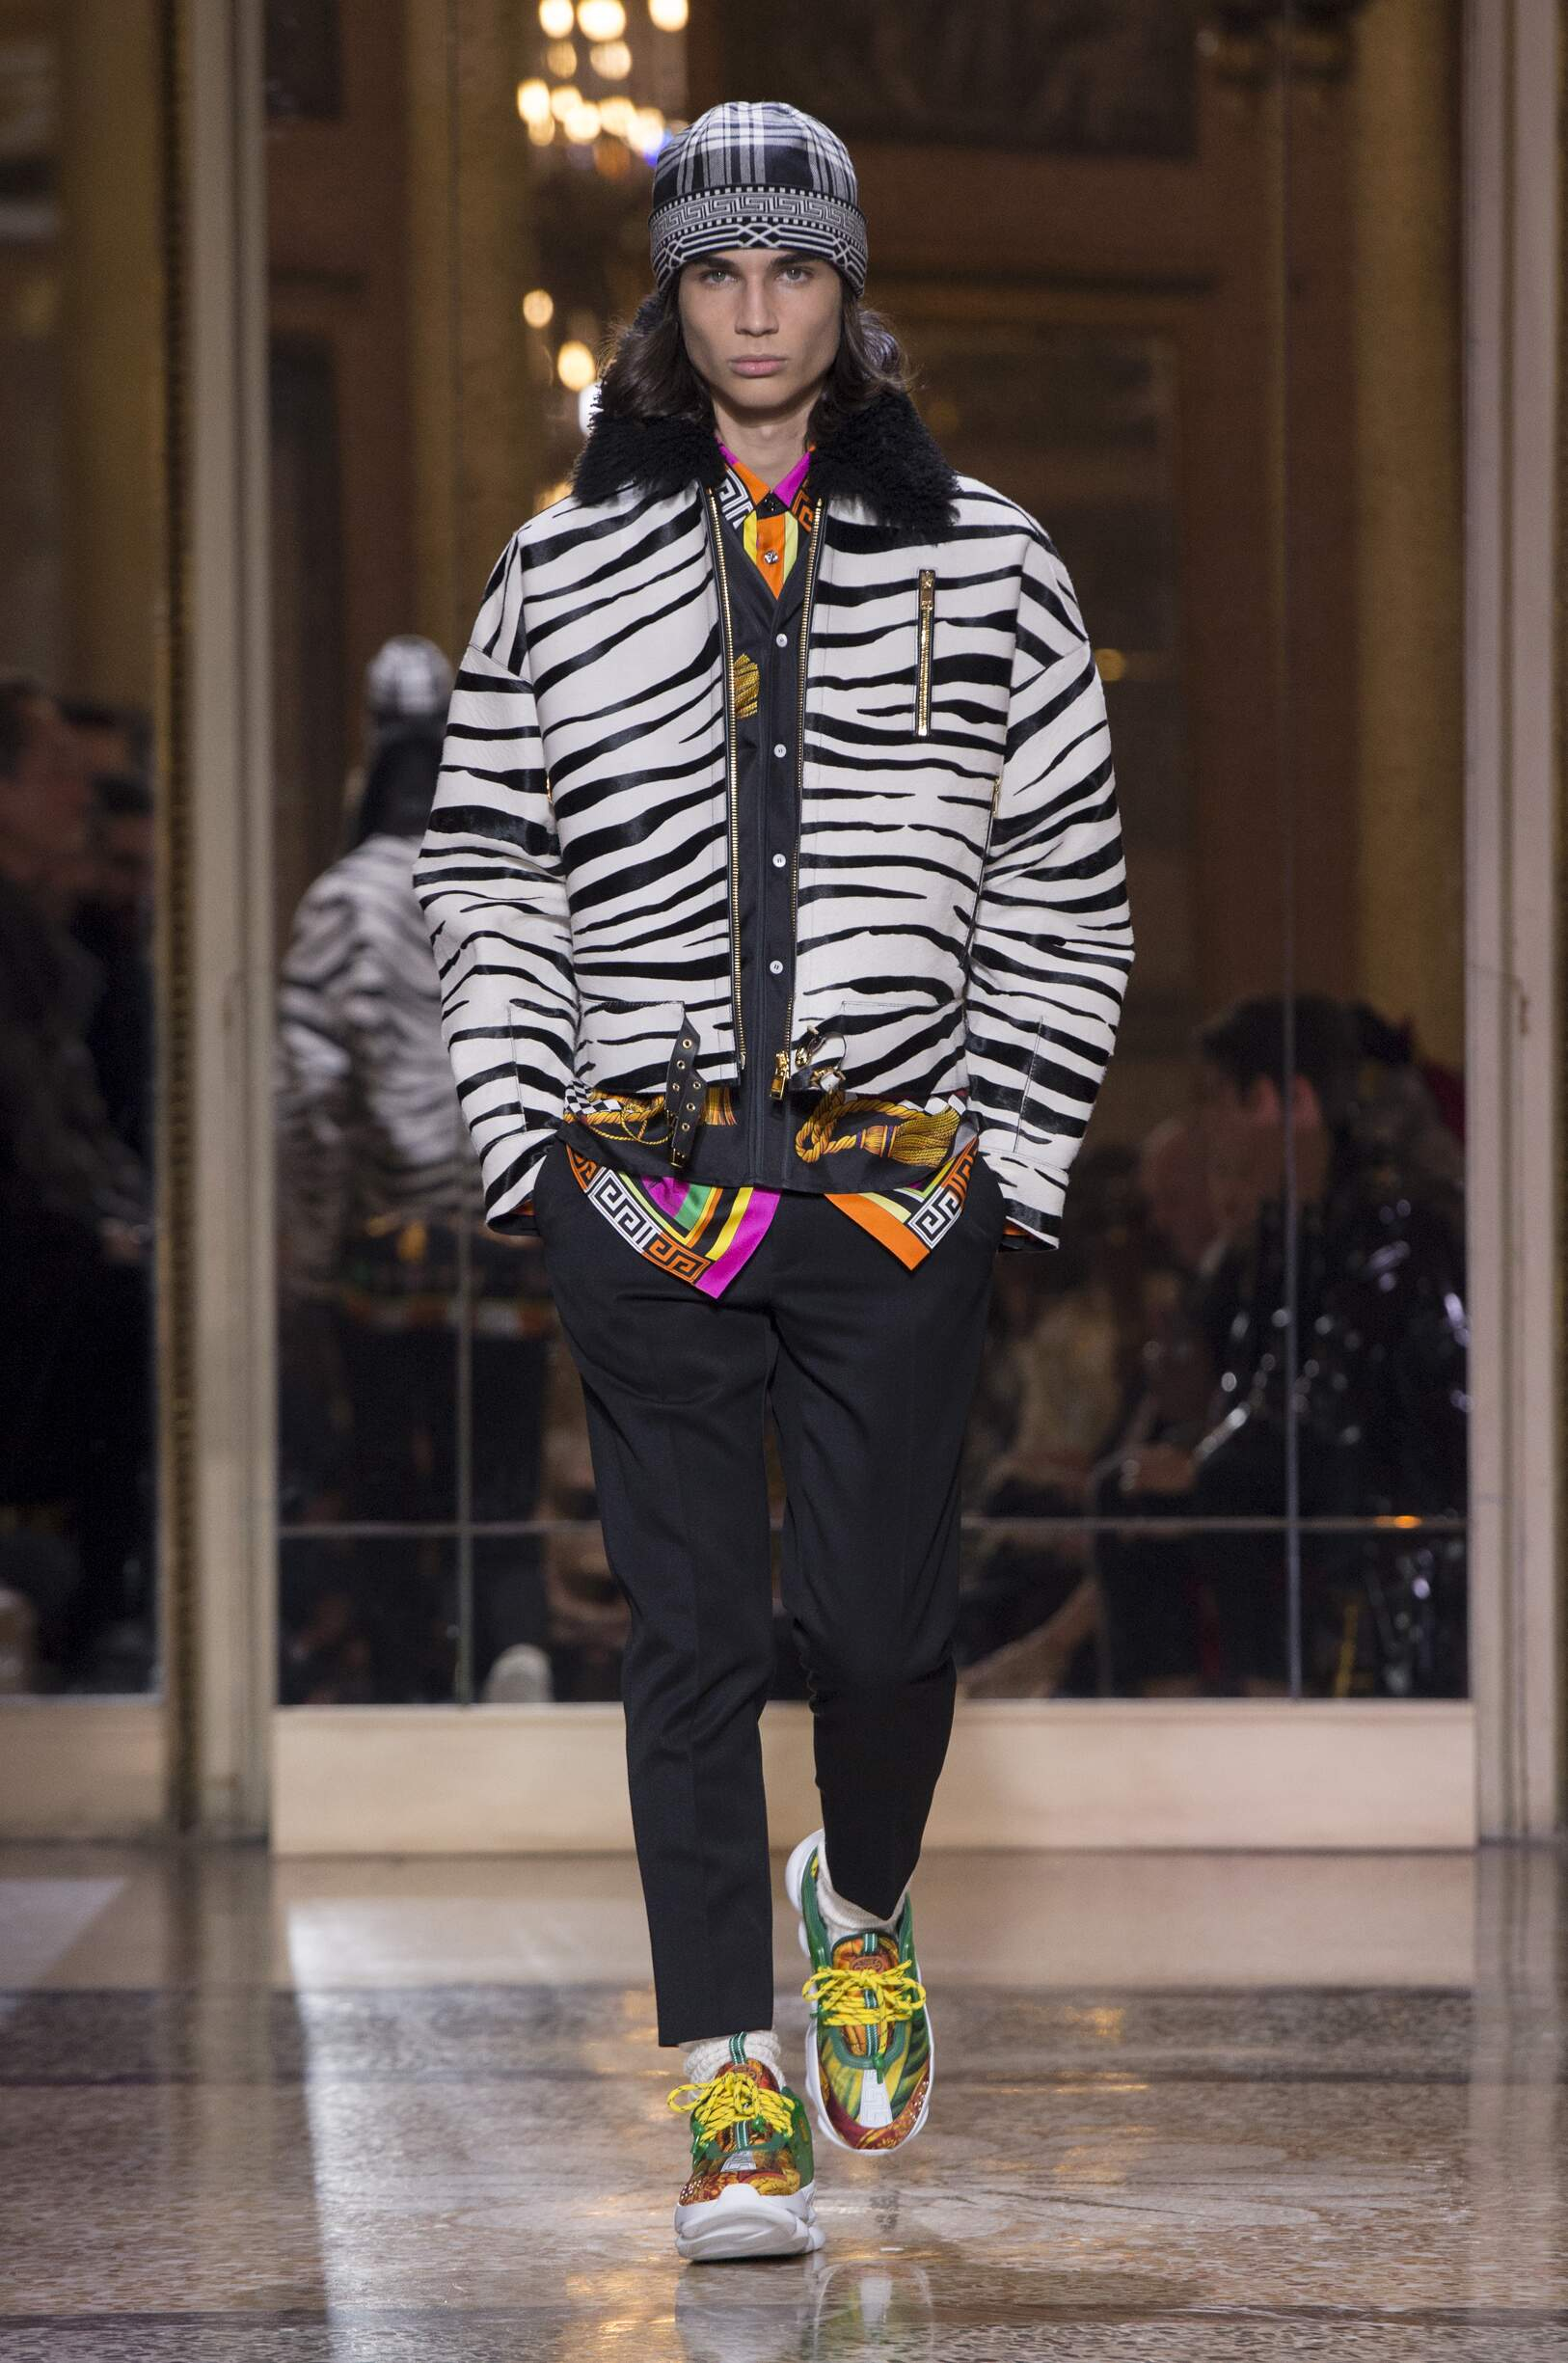 2018 Catwalk Versace Man Fashion Show Winter